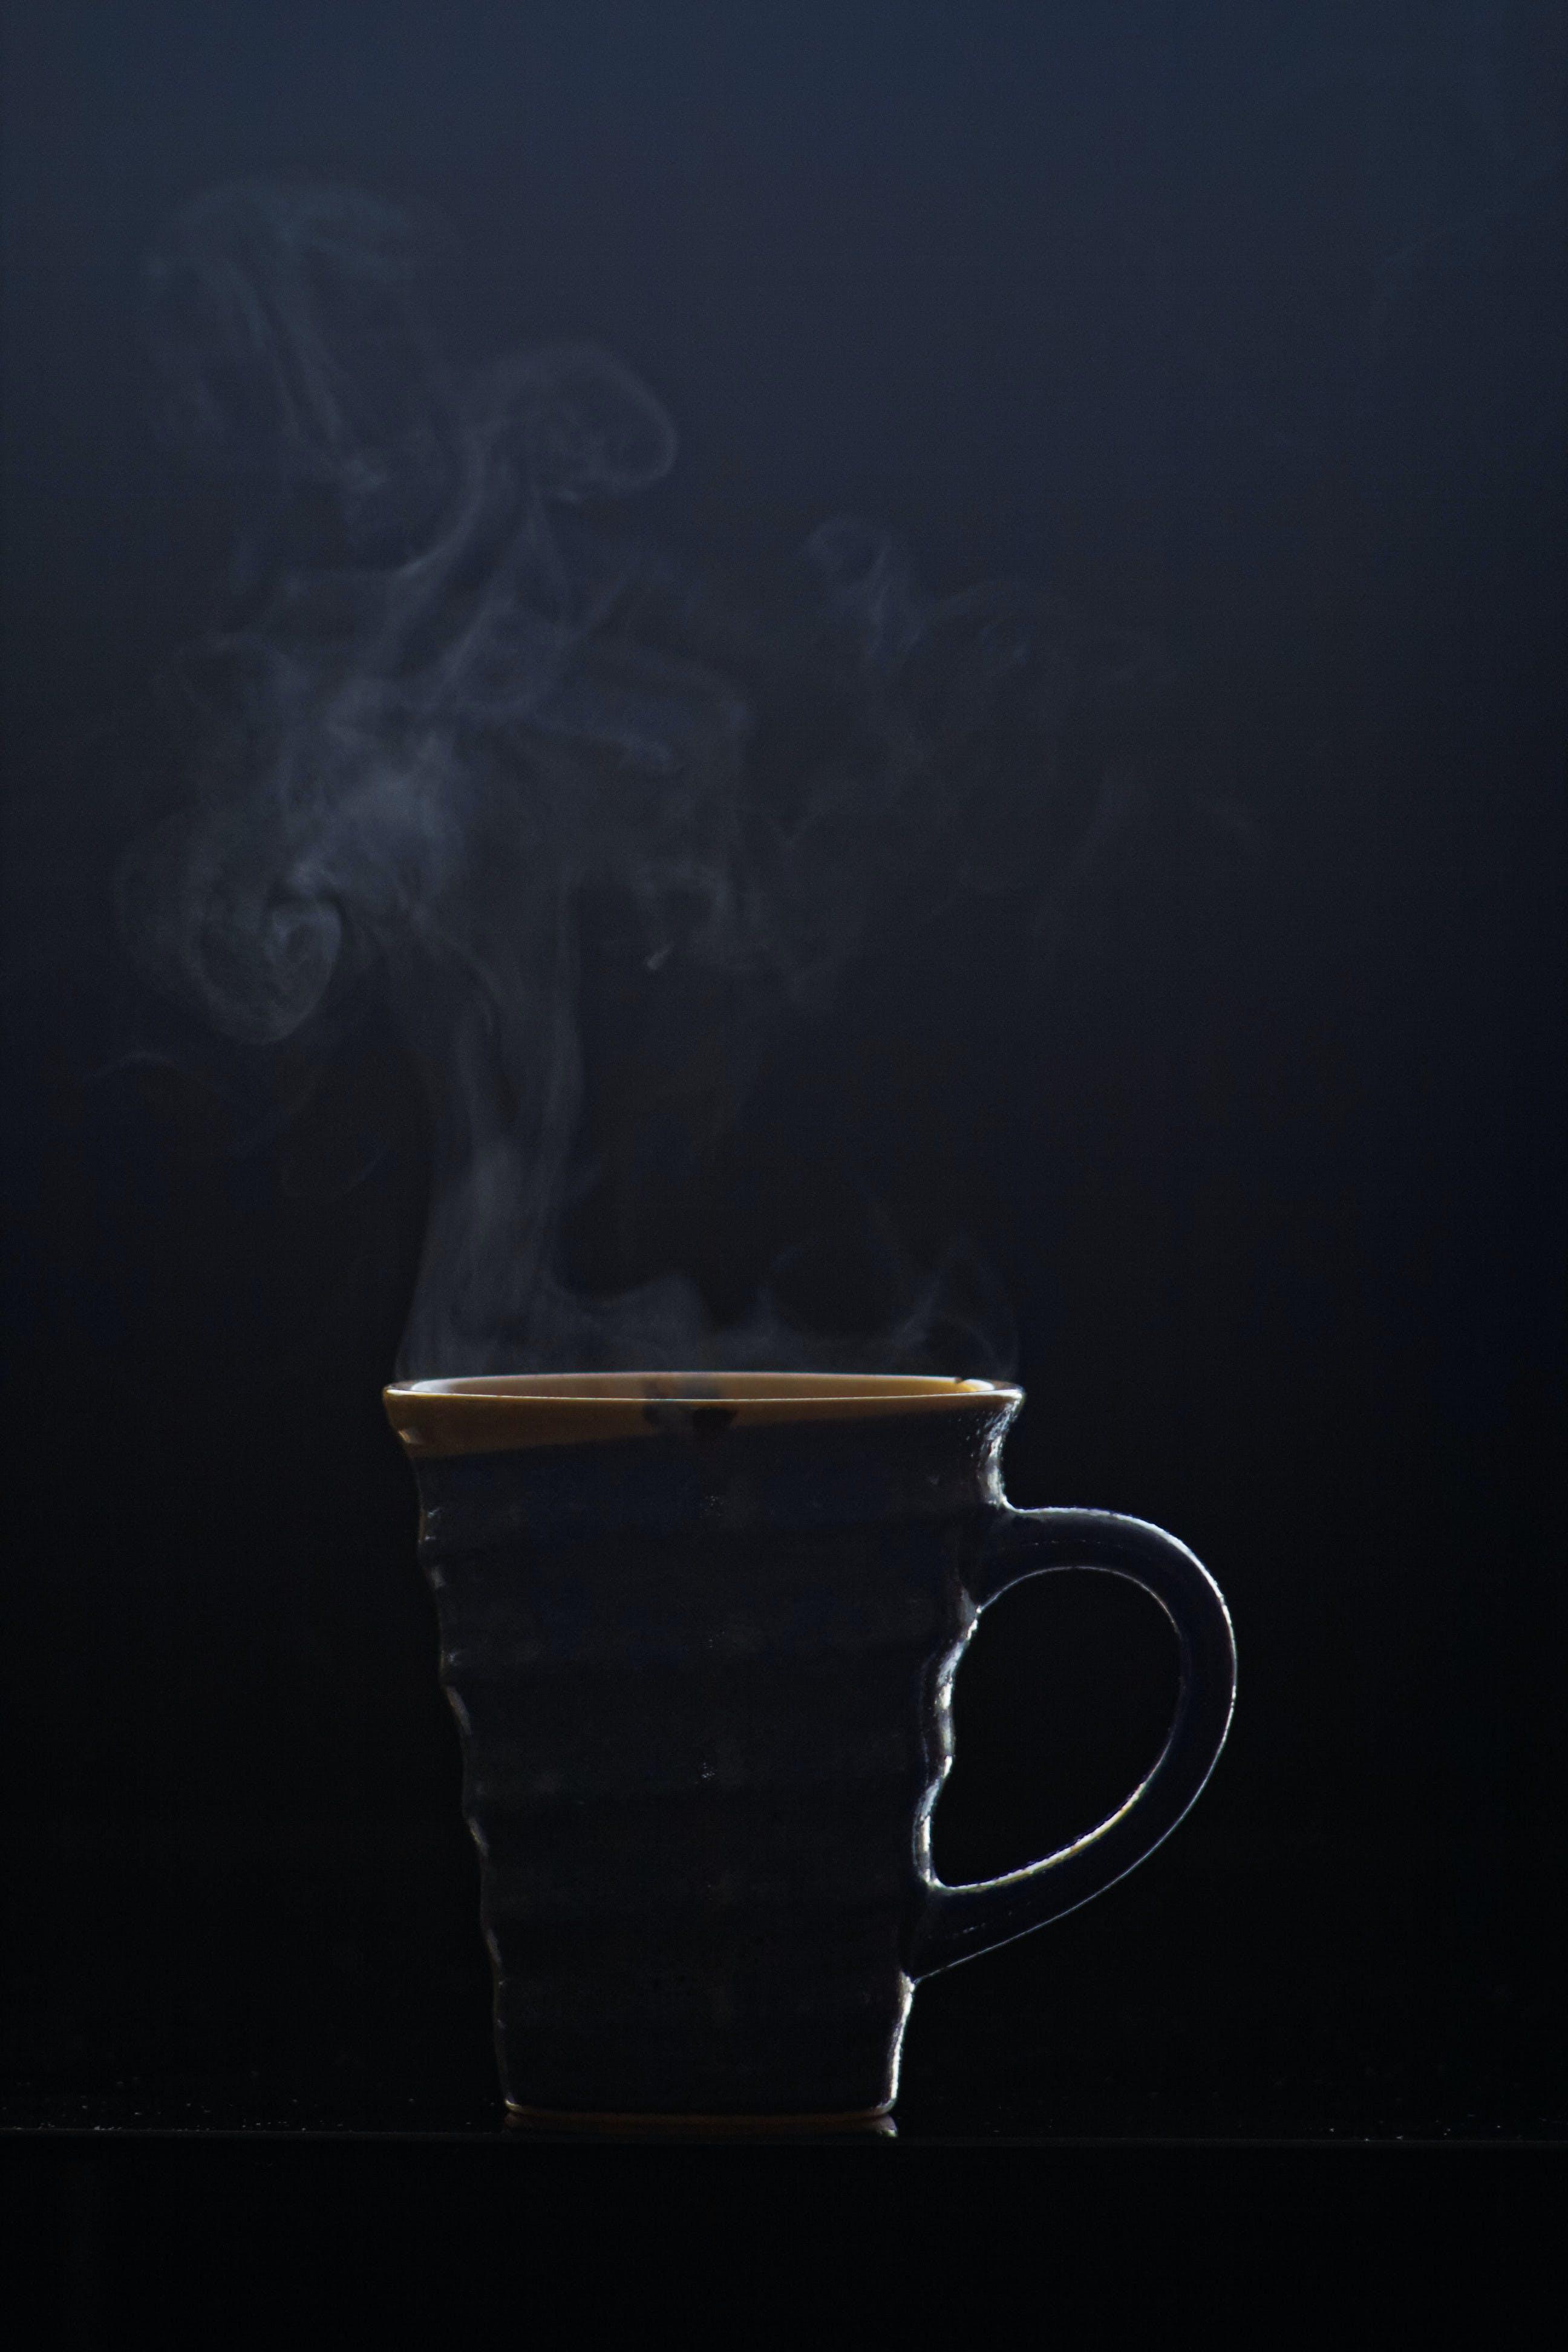 Free stock photo of mug, hot, steam